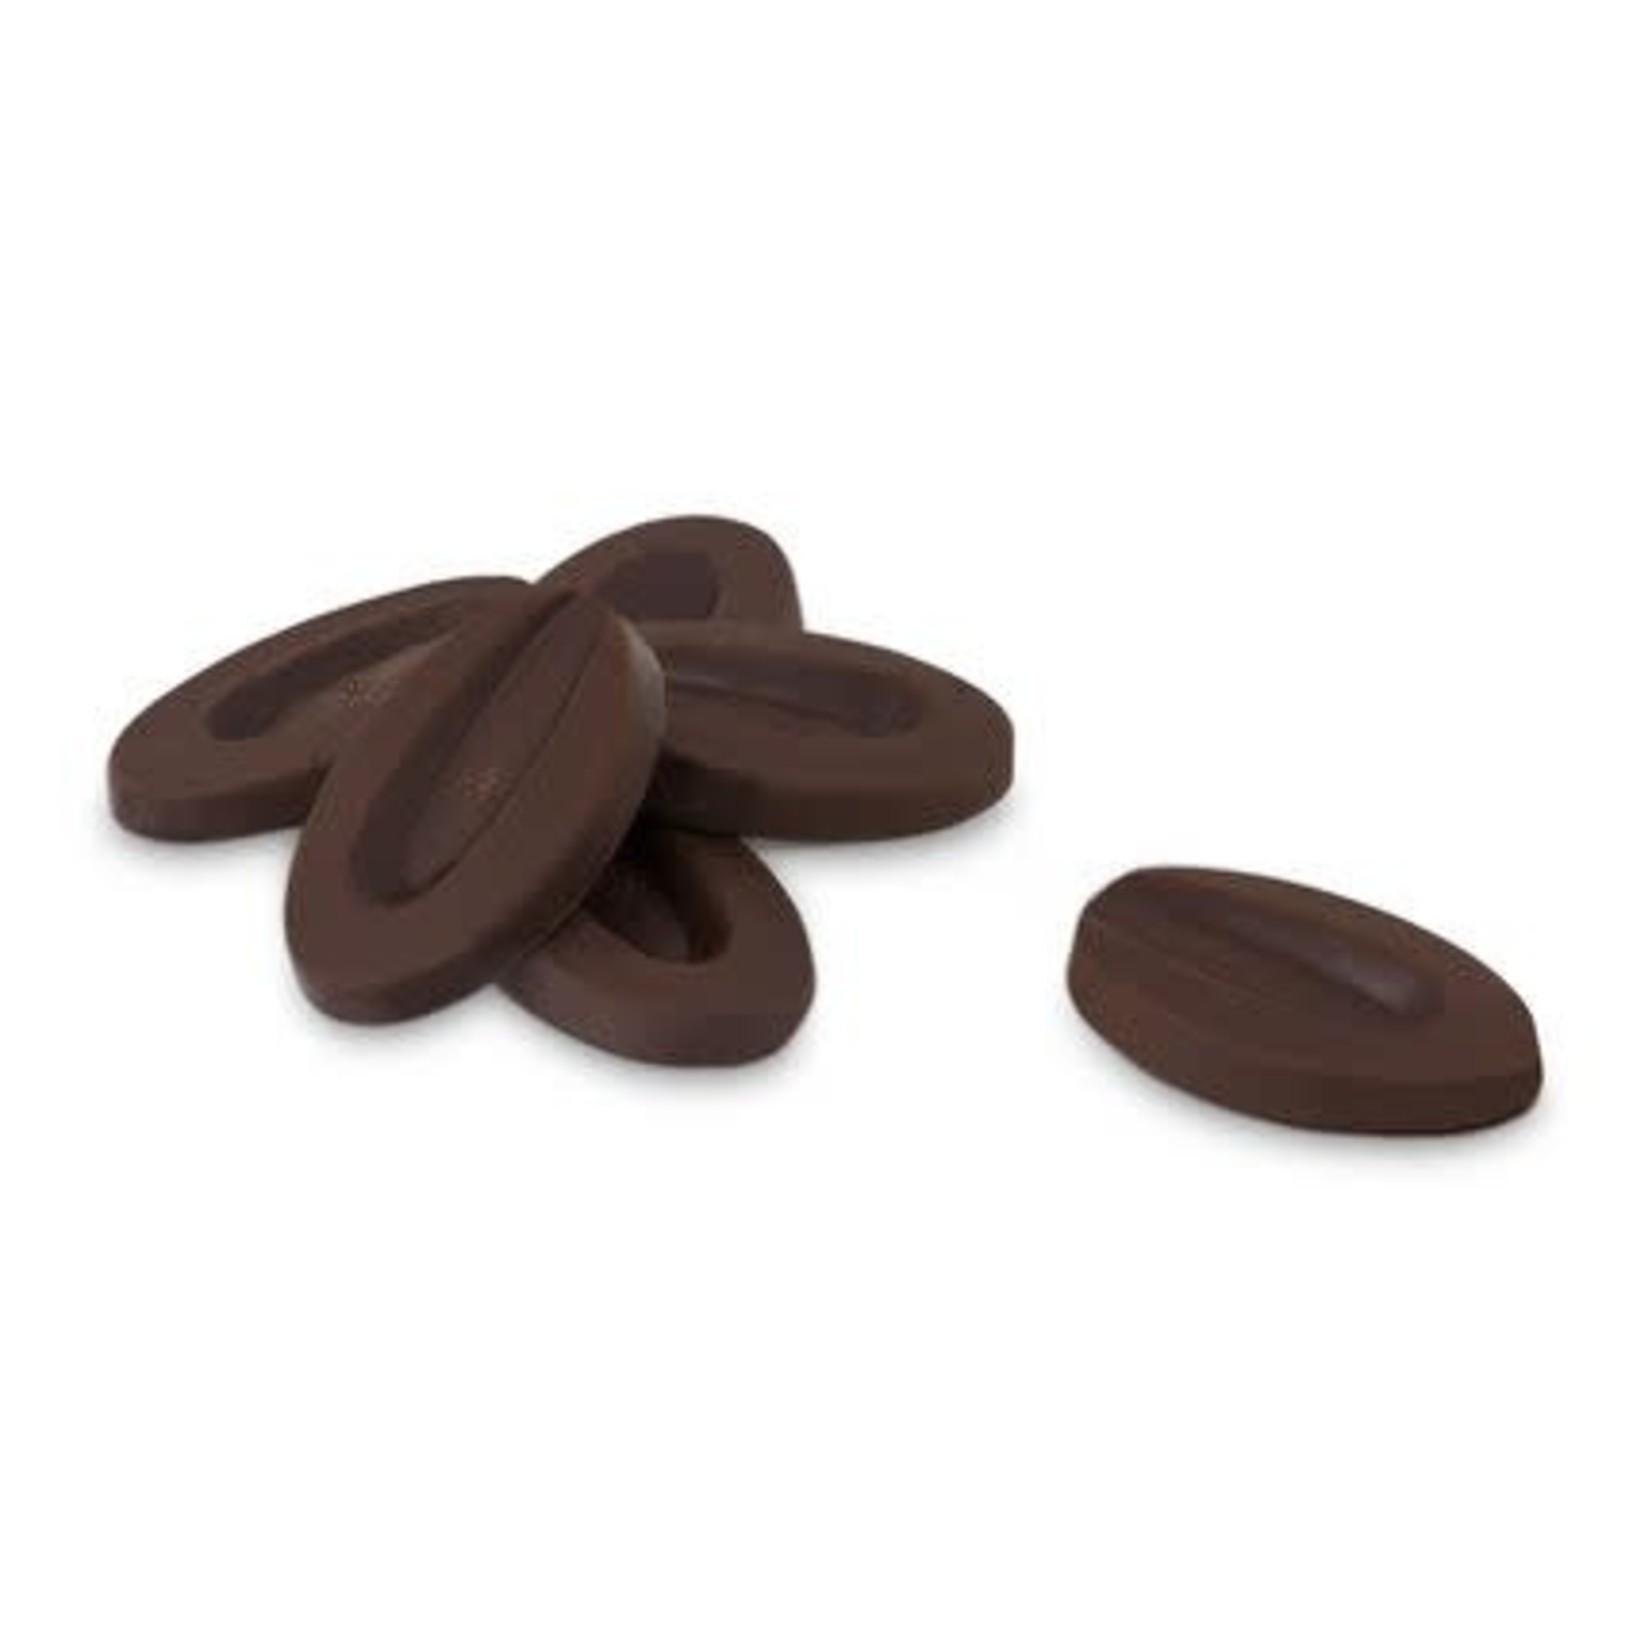 Valrhona Valrhona - Satilia Dark Chocolate 62% - 26.5lb/12kg, 7346